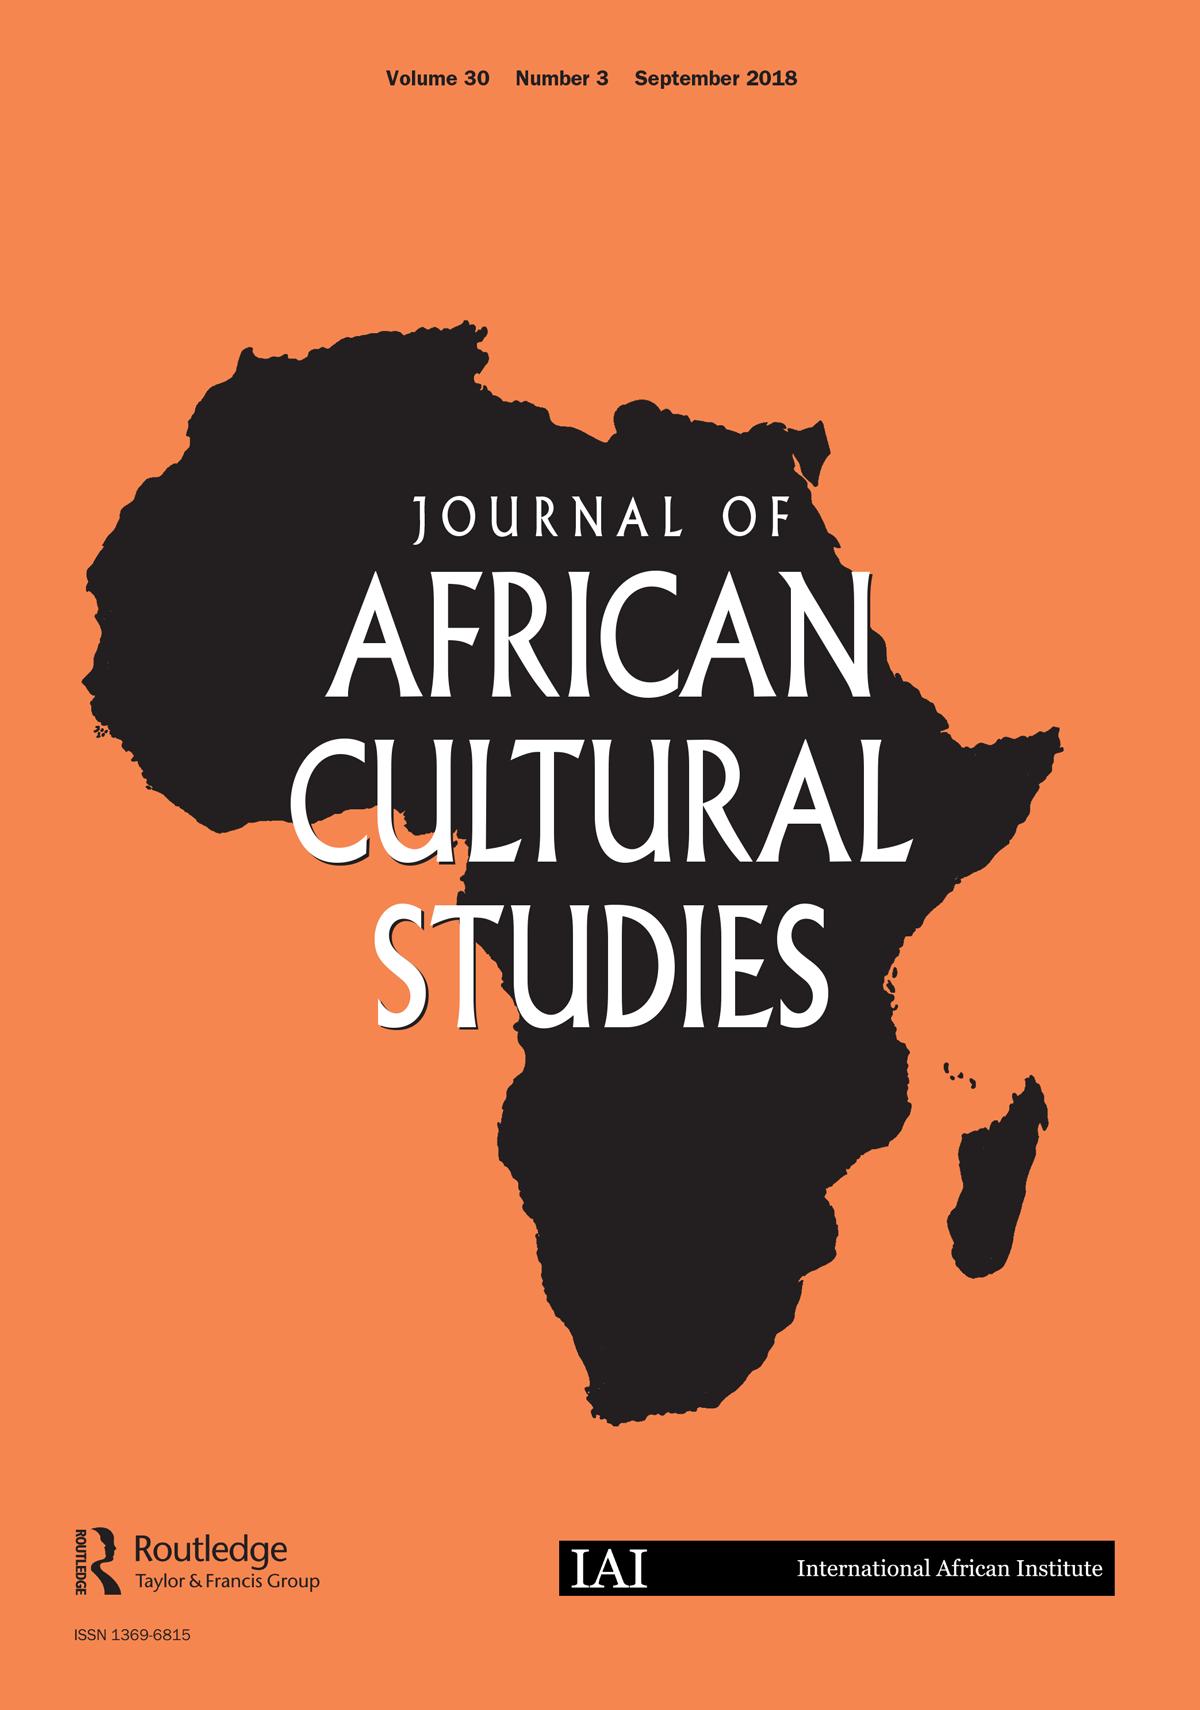 Journal of African Cultural Studies